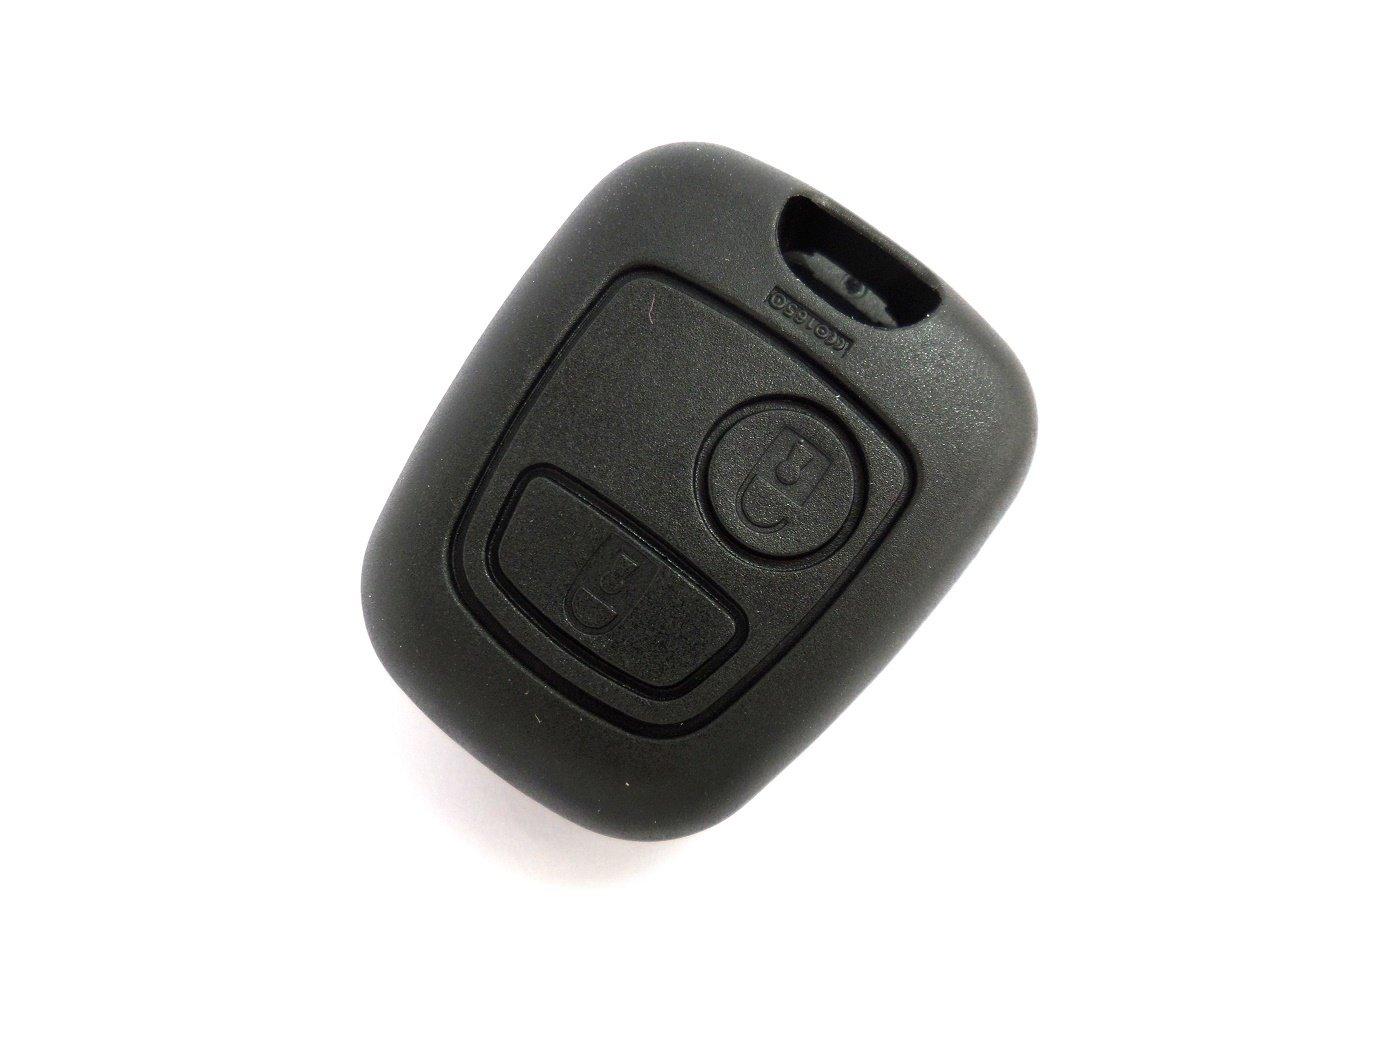 Auto Carcasa para Llave de Peugeot 106 206 207 306 307 406 ...